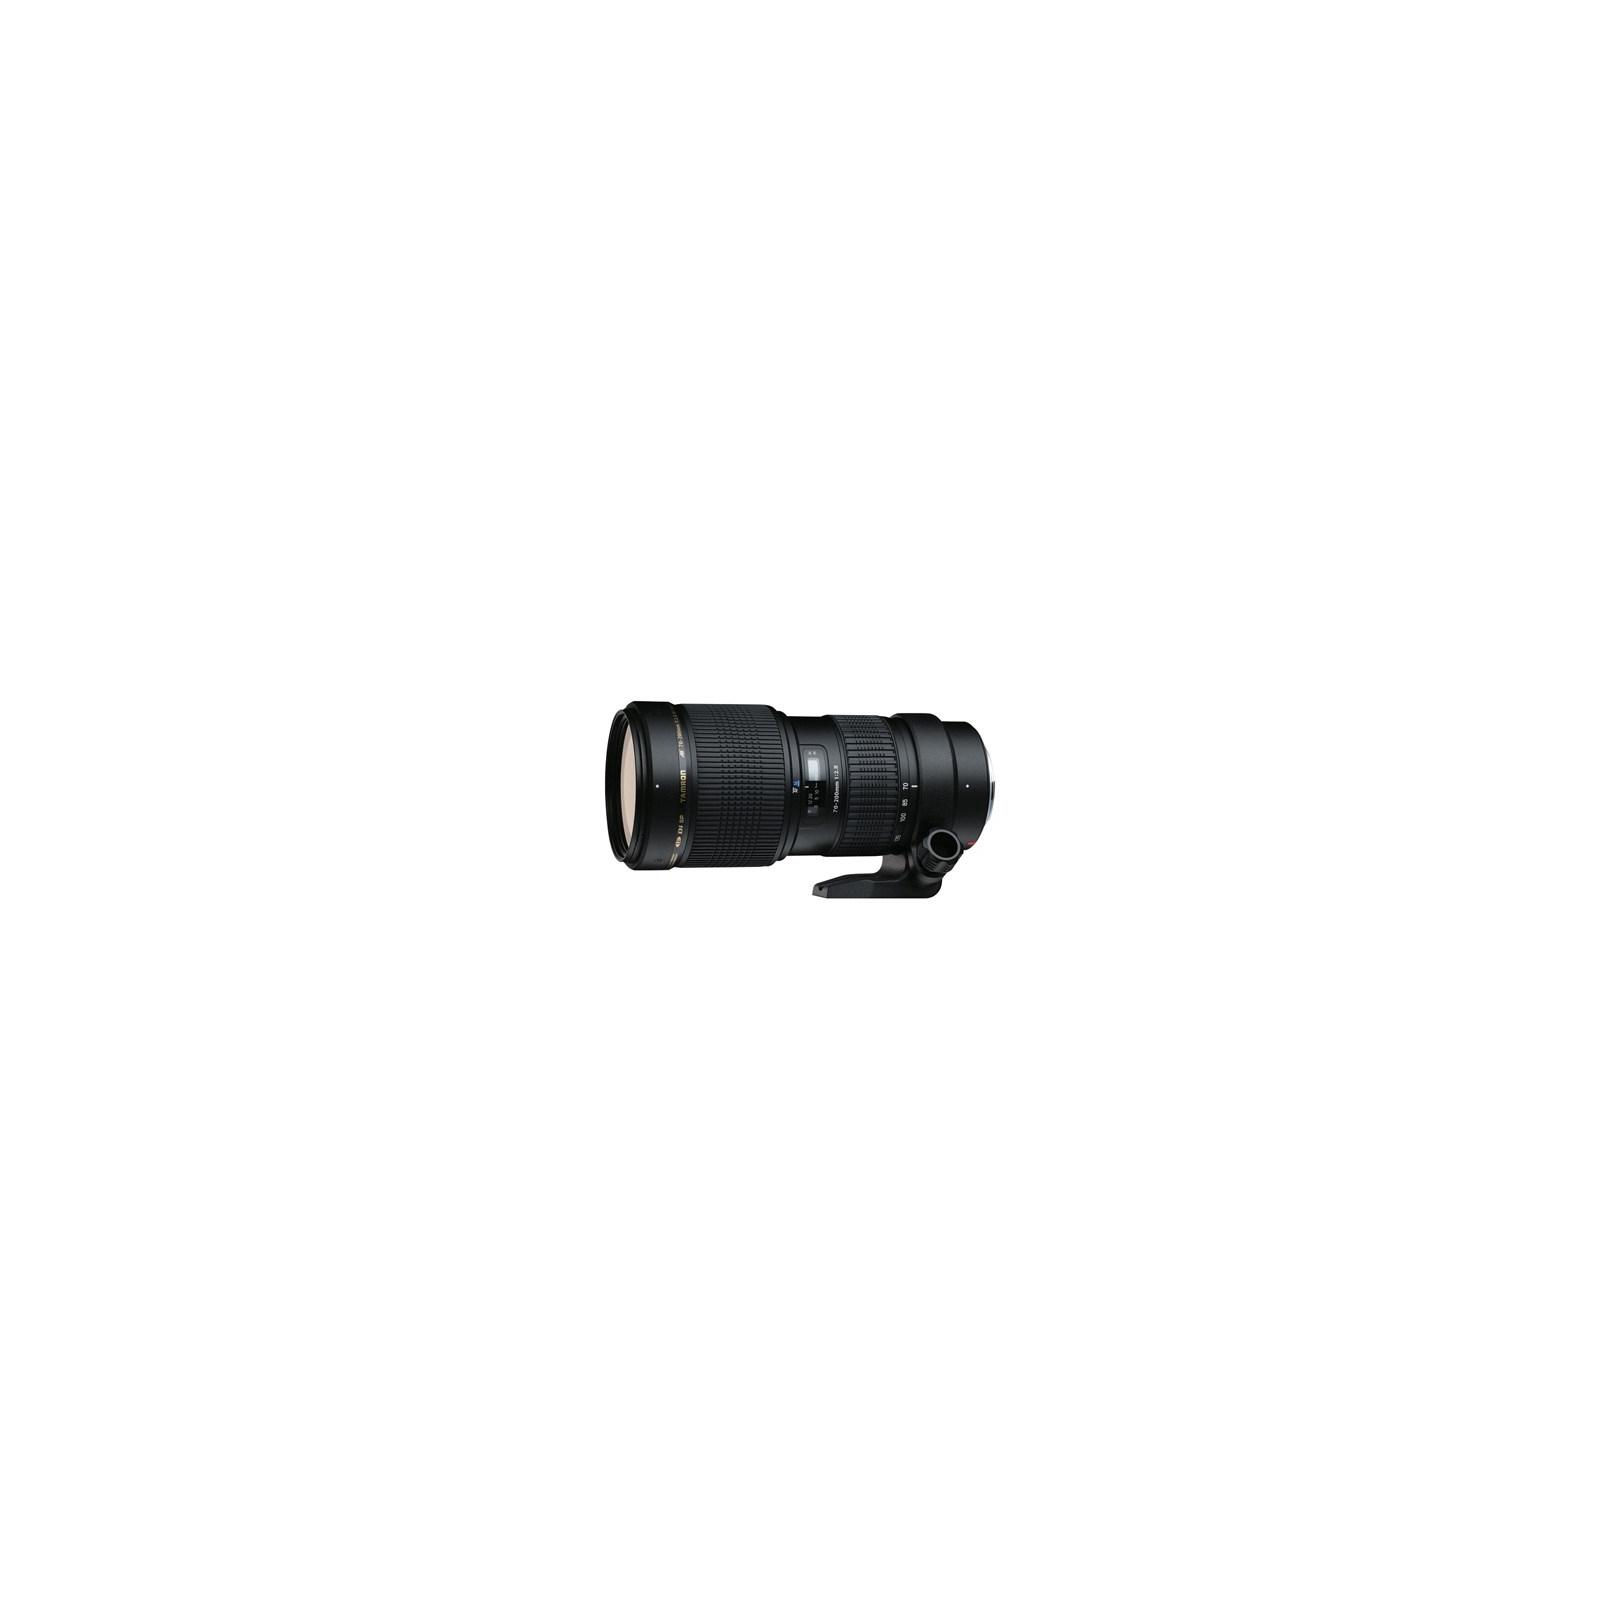 Объектив Tamron SP AF 70-200 f/2.8 Di LD (IF) macro for Nikon (AF 70-200mm macro for Nikon)